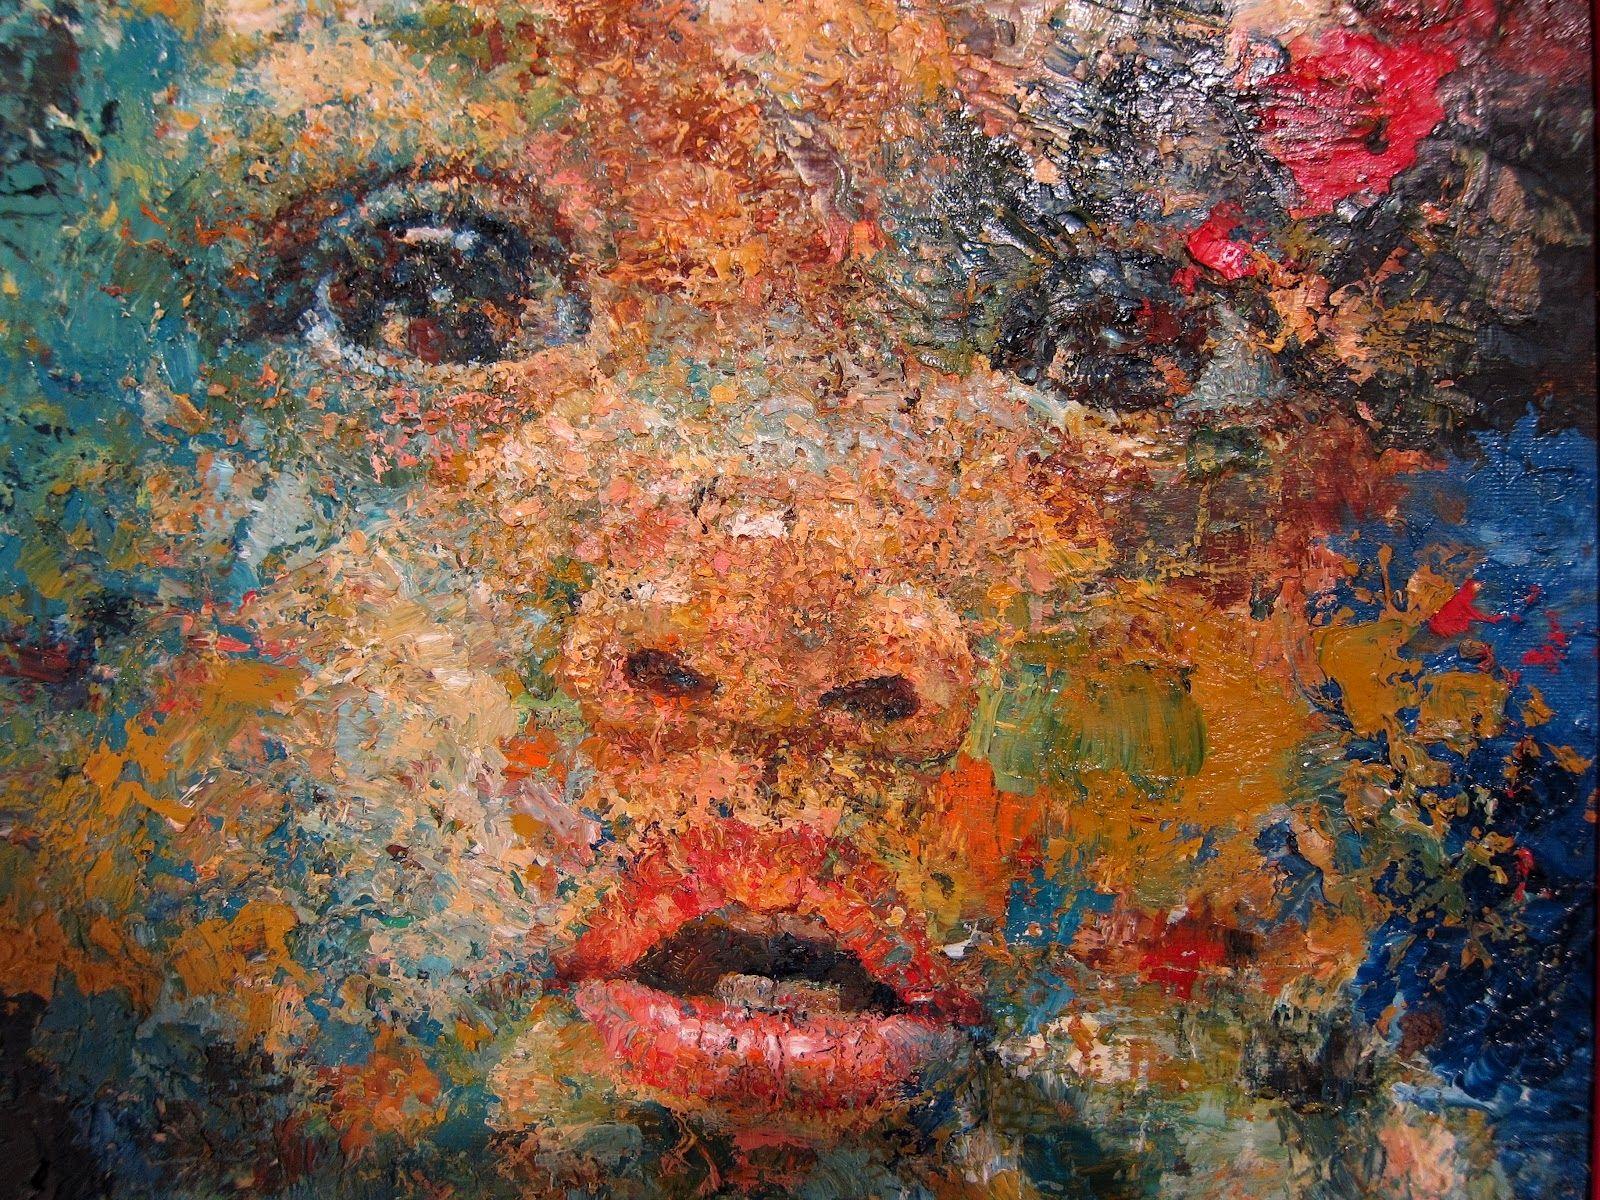 Jef CABLOG in 2020 Filipino art, Philippine art, Painting